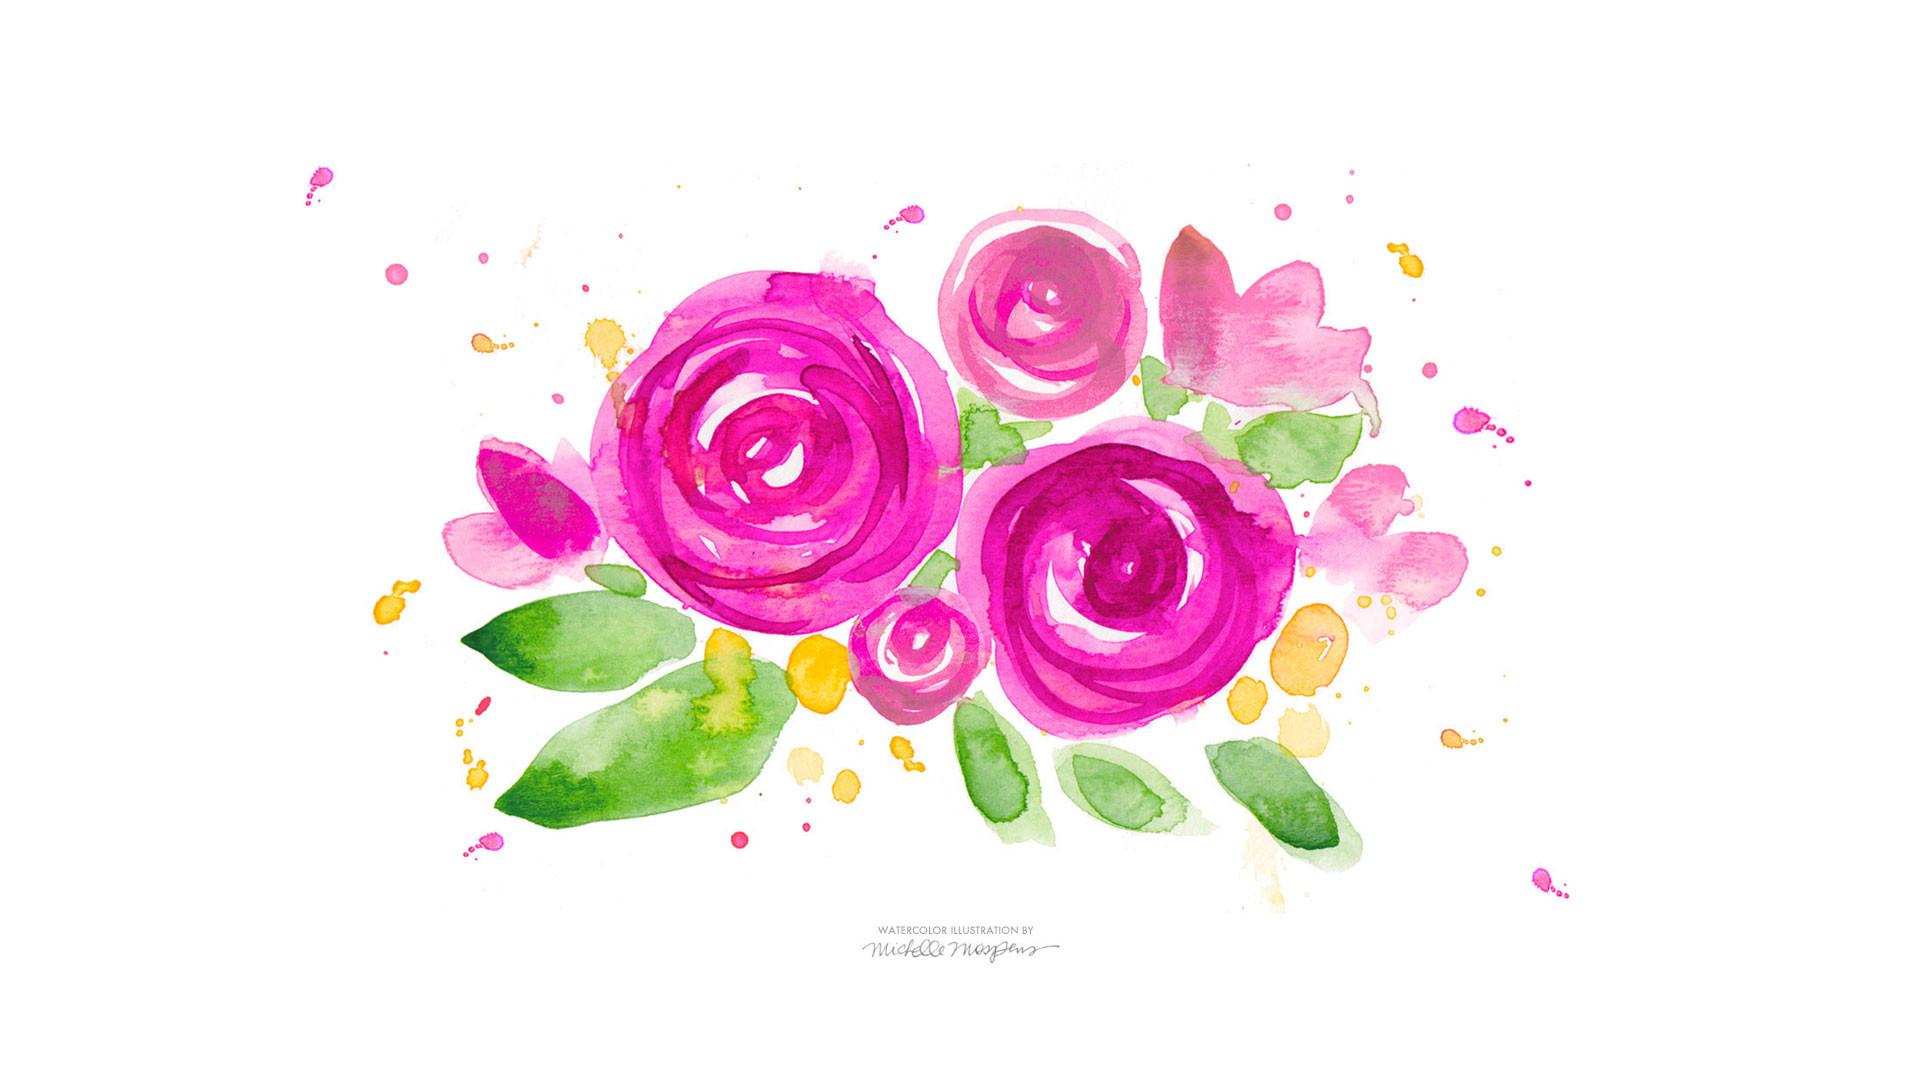 Blossom-Burst-Desktop-Download-1920-1080.jpg (1920×1080) | Artsy |  Pinterest | Wallpaper backgrounds, Watercolor and Wallpaper